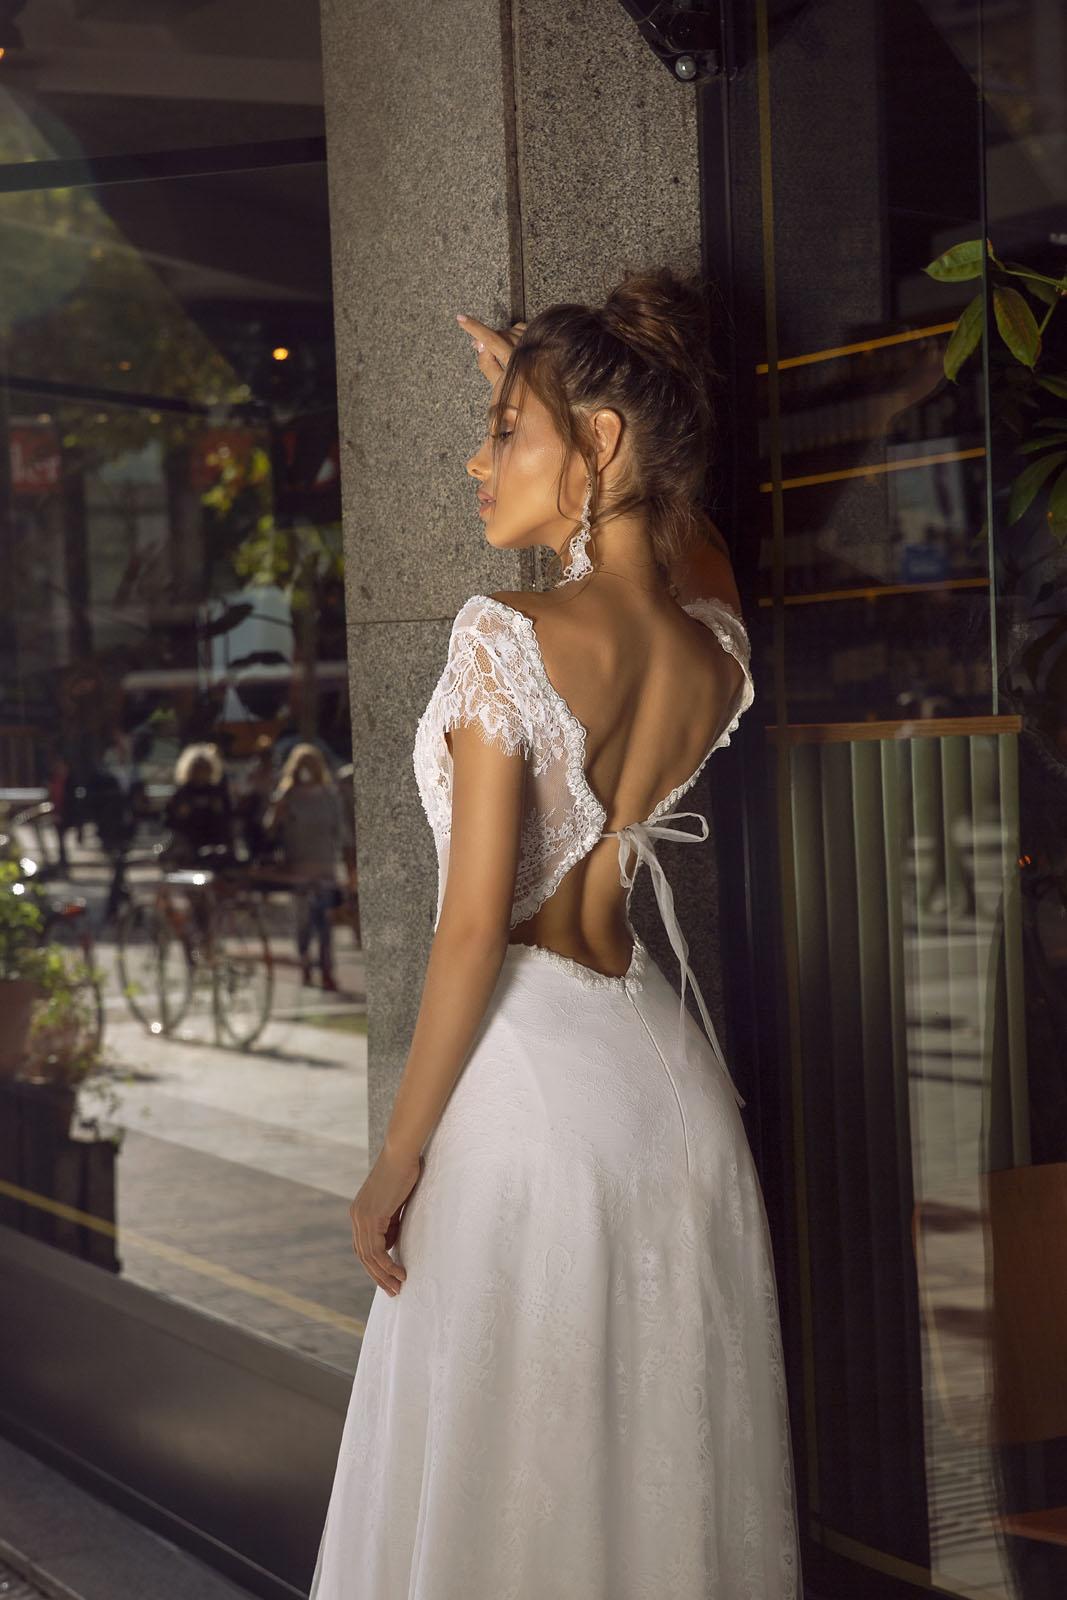 PANDORA-Passion by Tina-Tina Valerdi - Kolekcja 2020